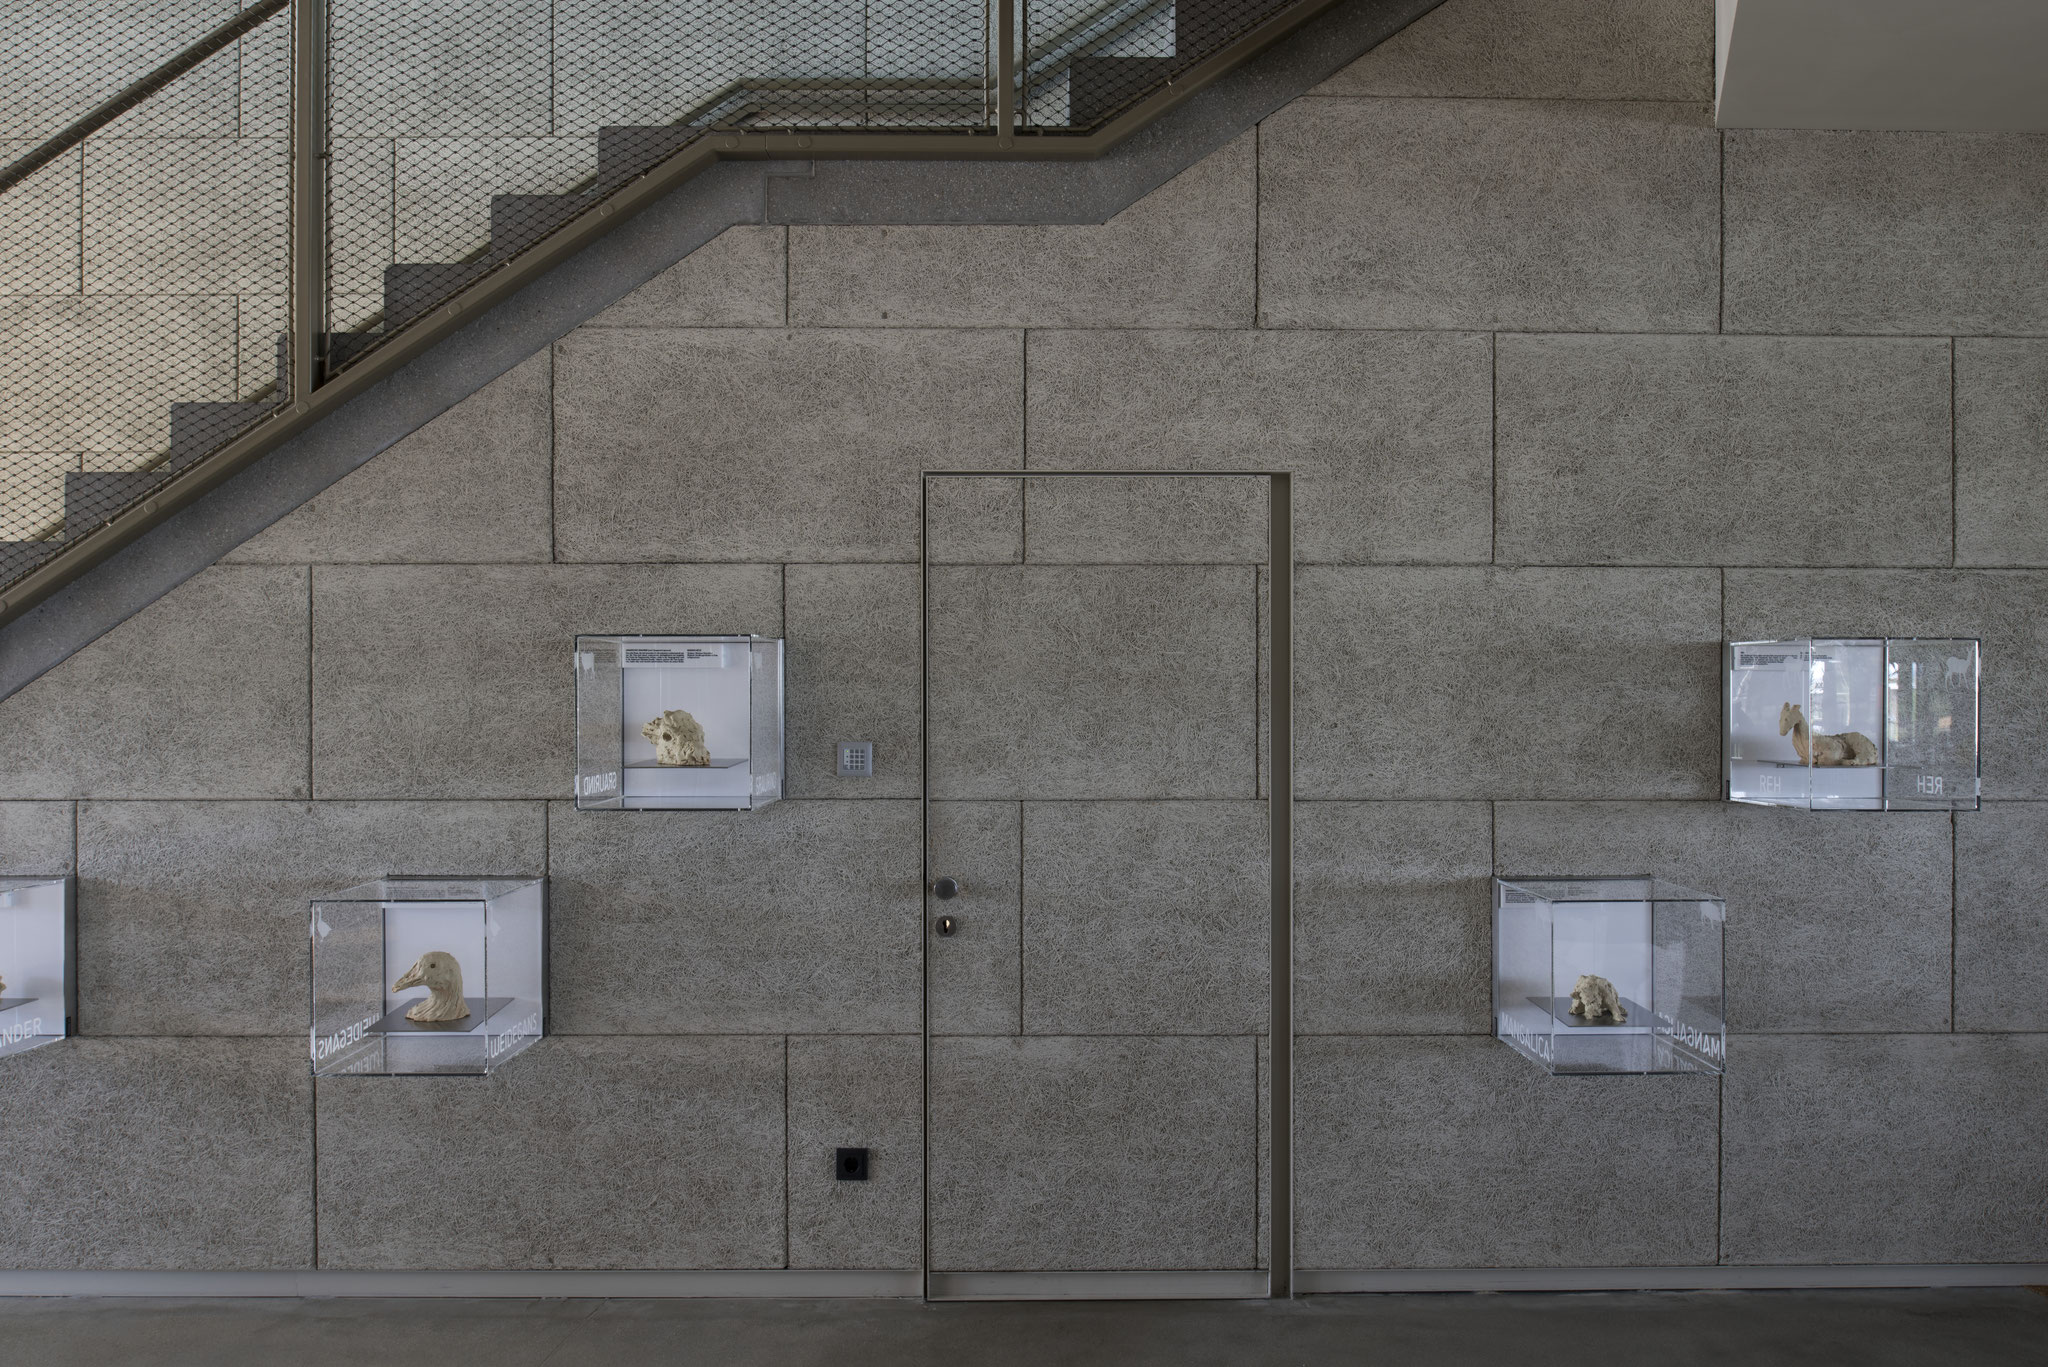 trockenbau trockenbau systeme akustik fellner. Black Bedroom Furniture Sets. Home Design Ideas